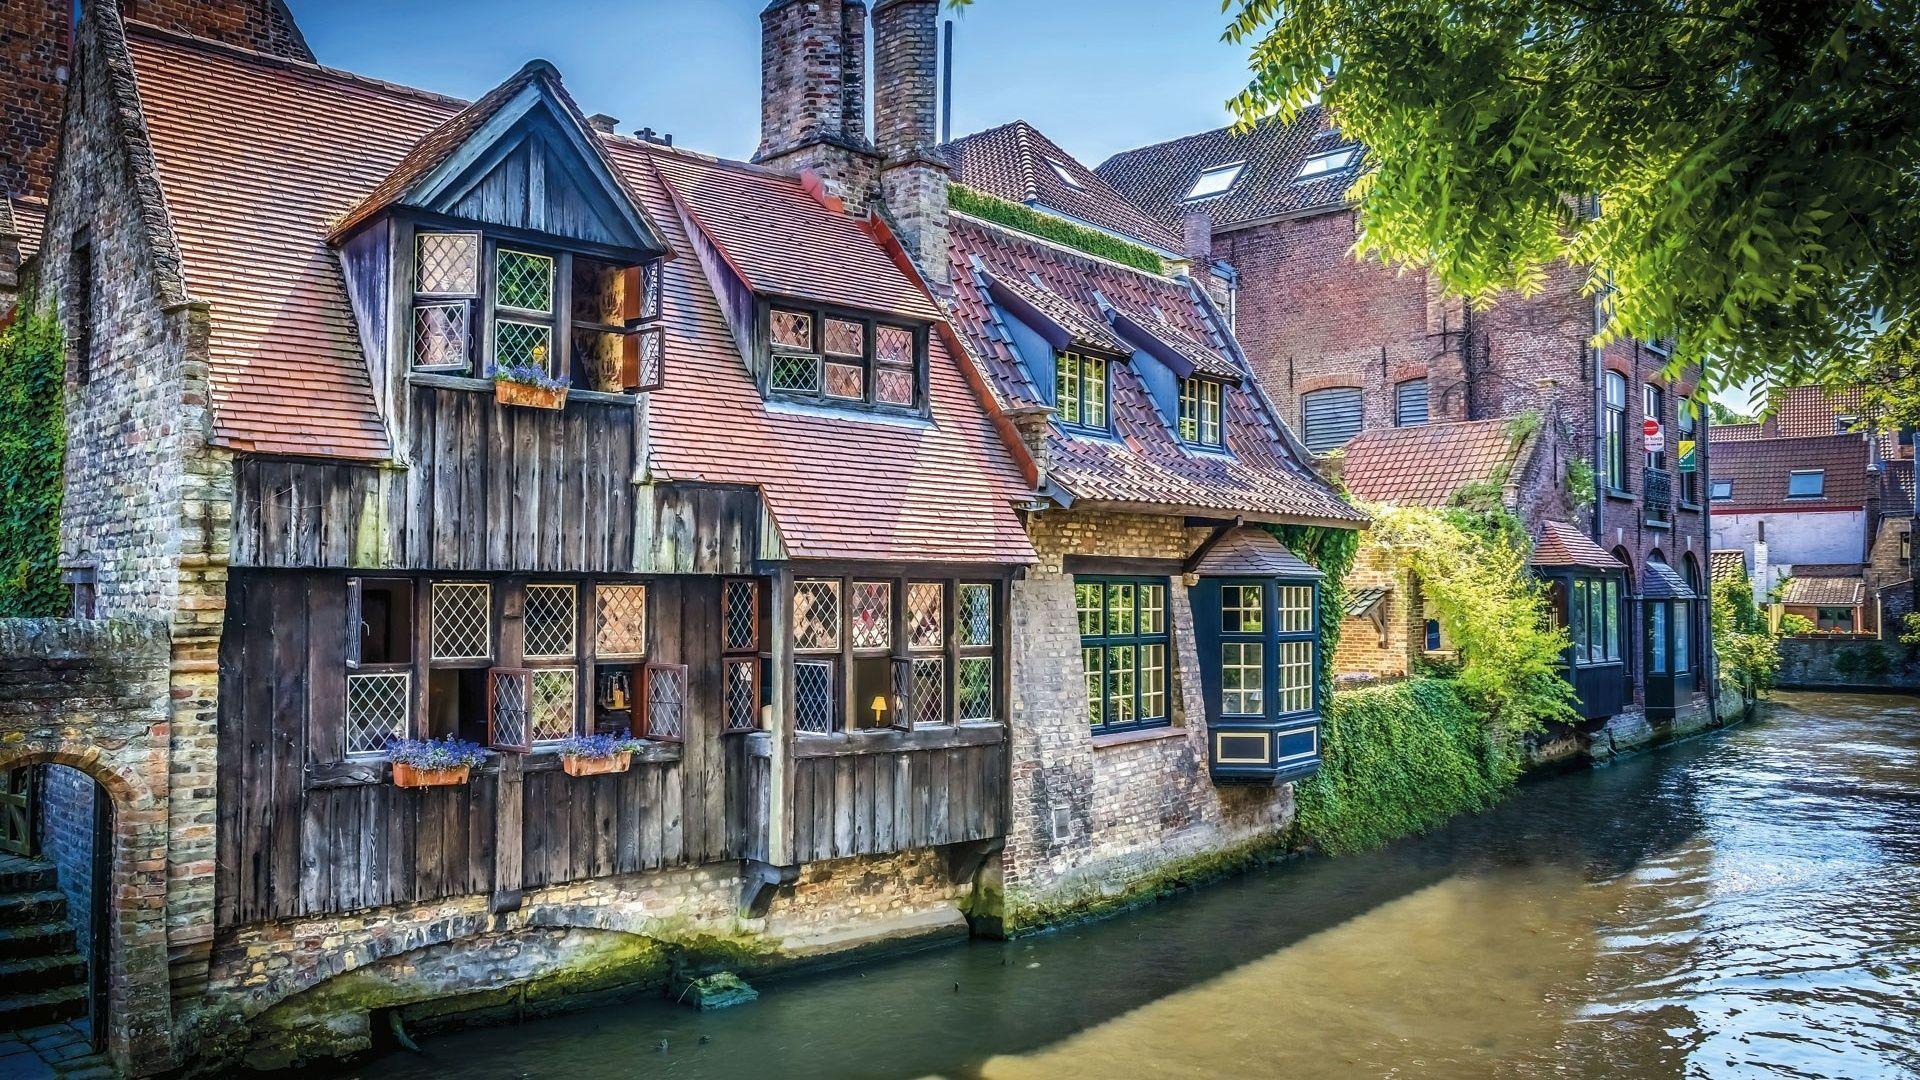 1920x1080 Brugge, Belgium, Houses, Watter City, Brugge Canal ...